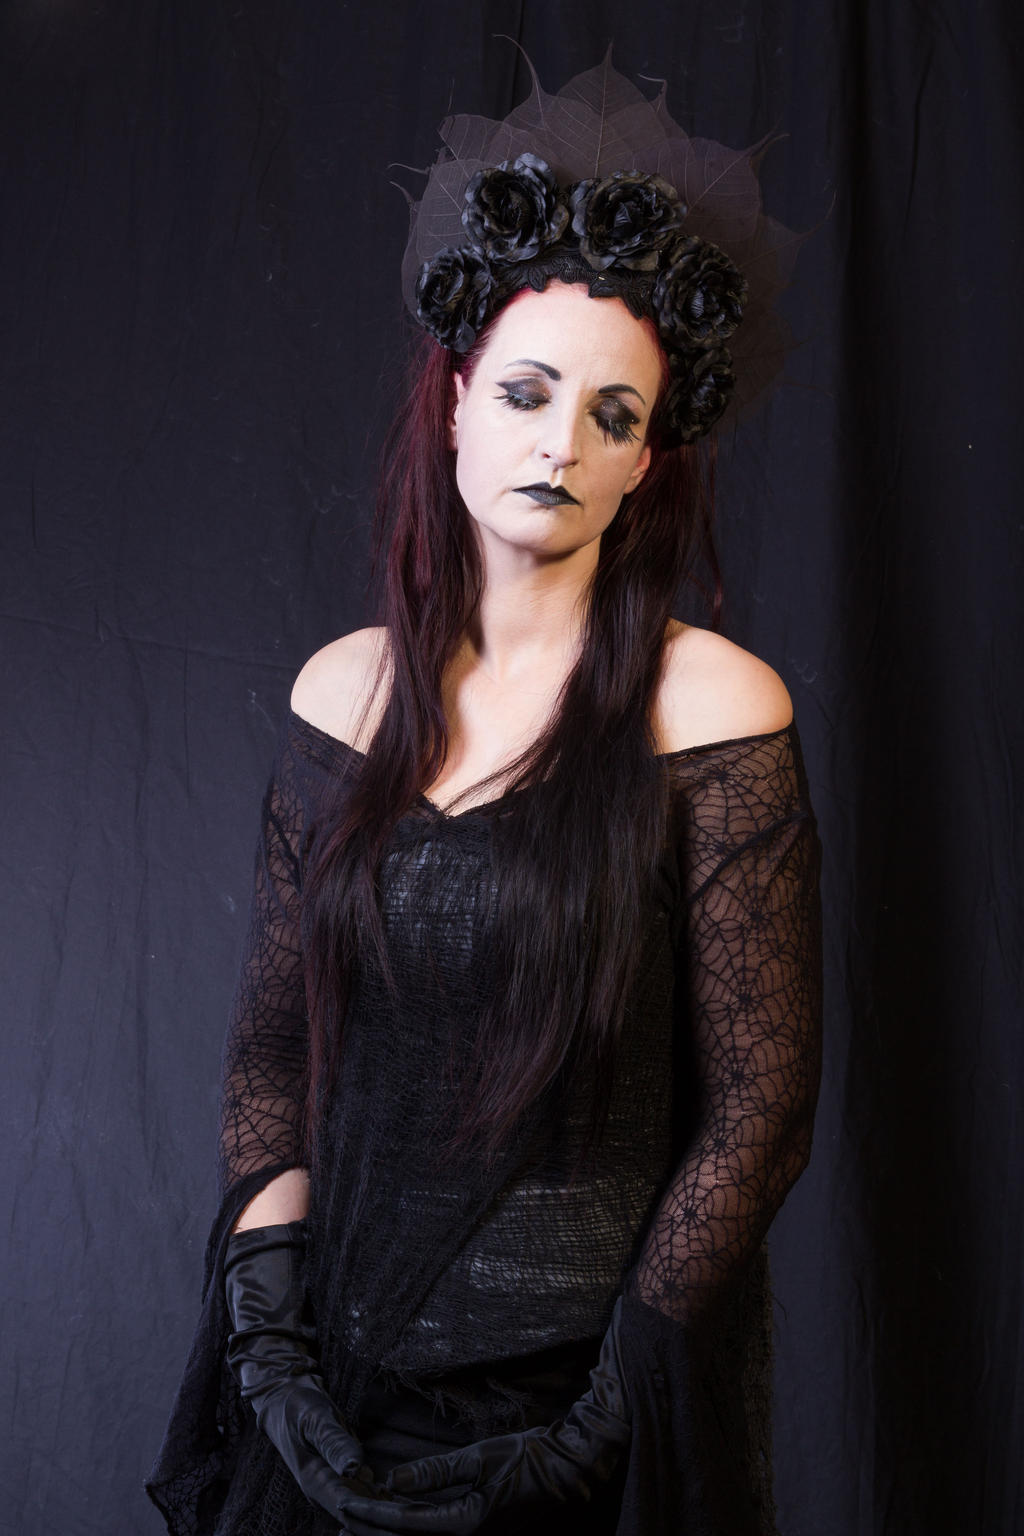 Stock - Gothic melancholy sad by S-T-A-R-gazer